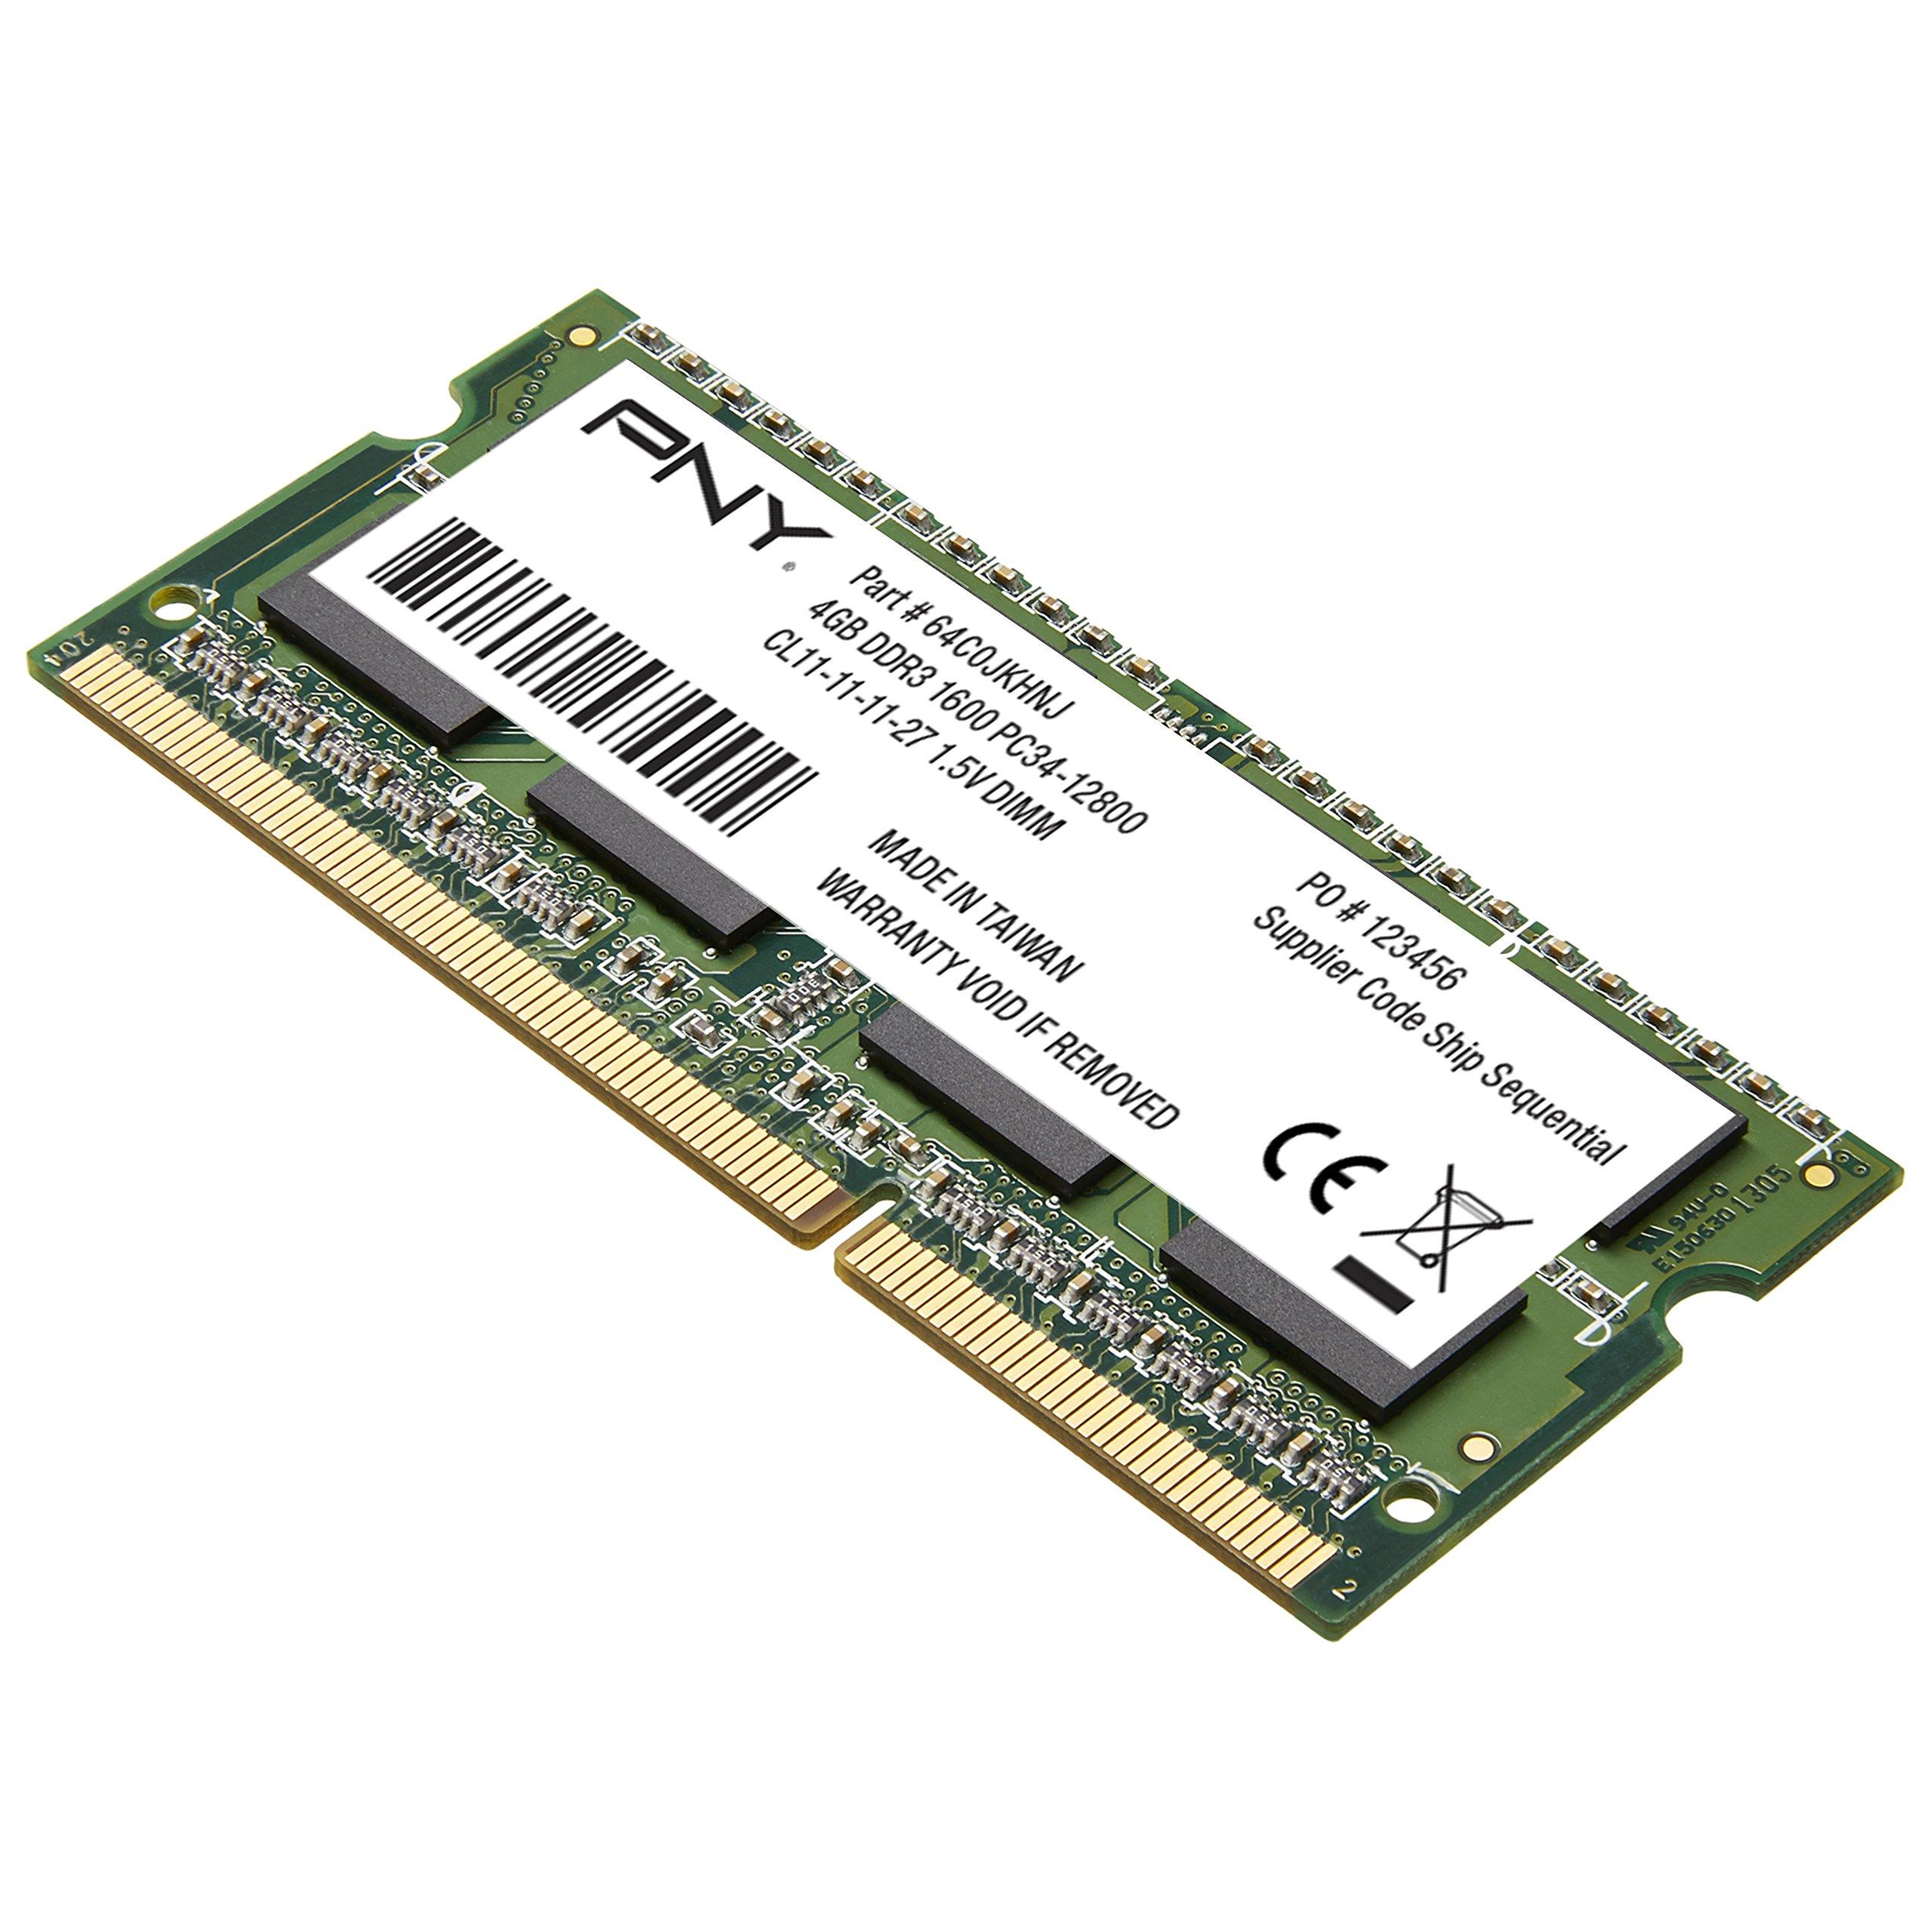 PNY 4GB PC3-12800 1600MHz DDR3 4GB DDR3 1600MHz memoria